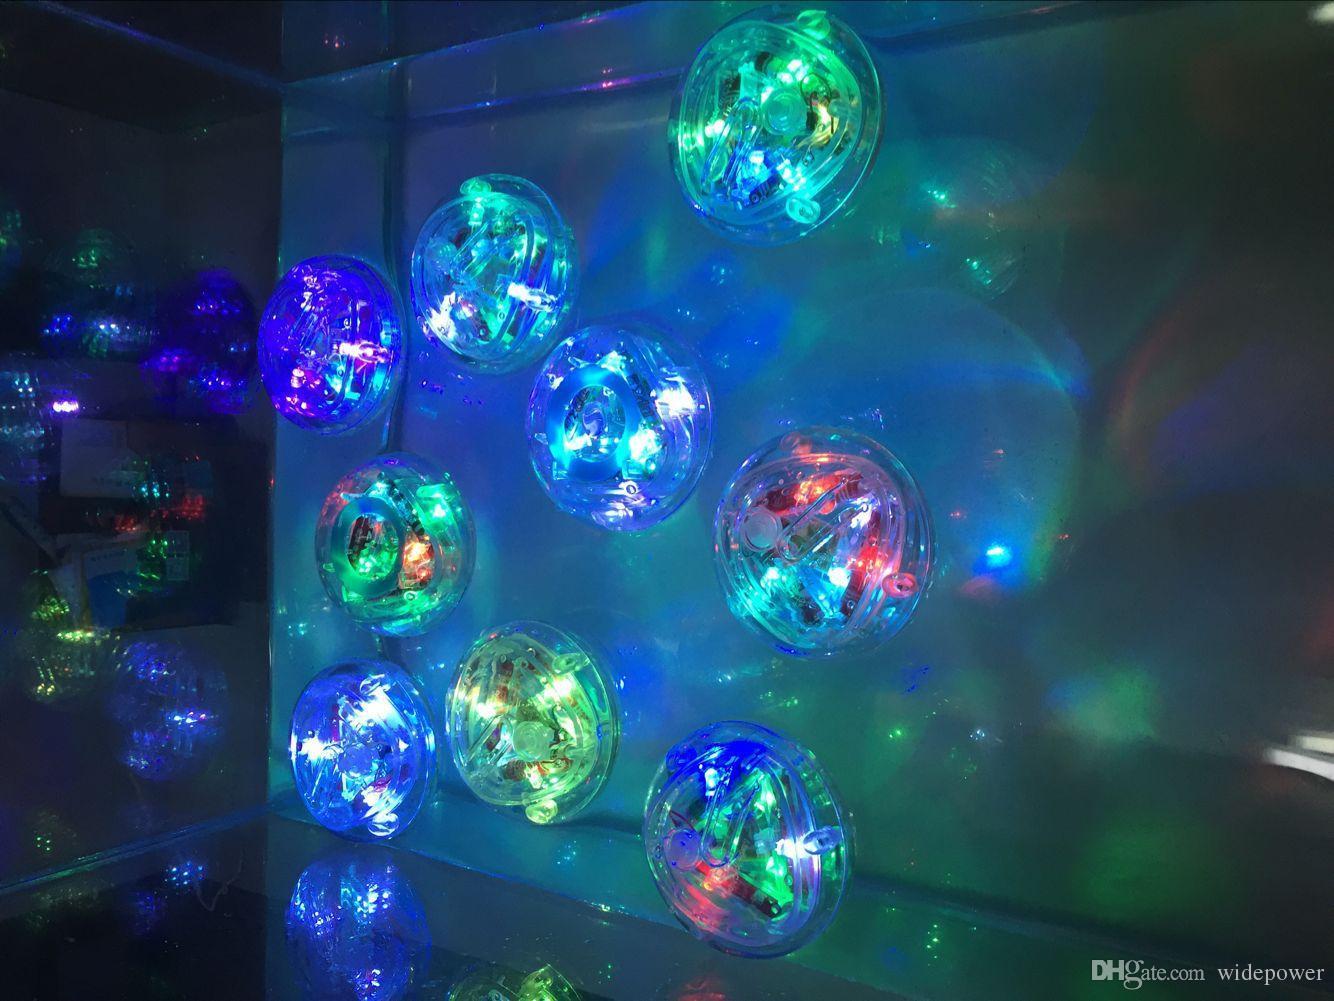 LED Bath Toy Party In The Tub Light Waterproof Bathroom Bathing Tub ...